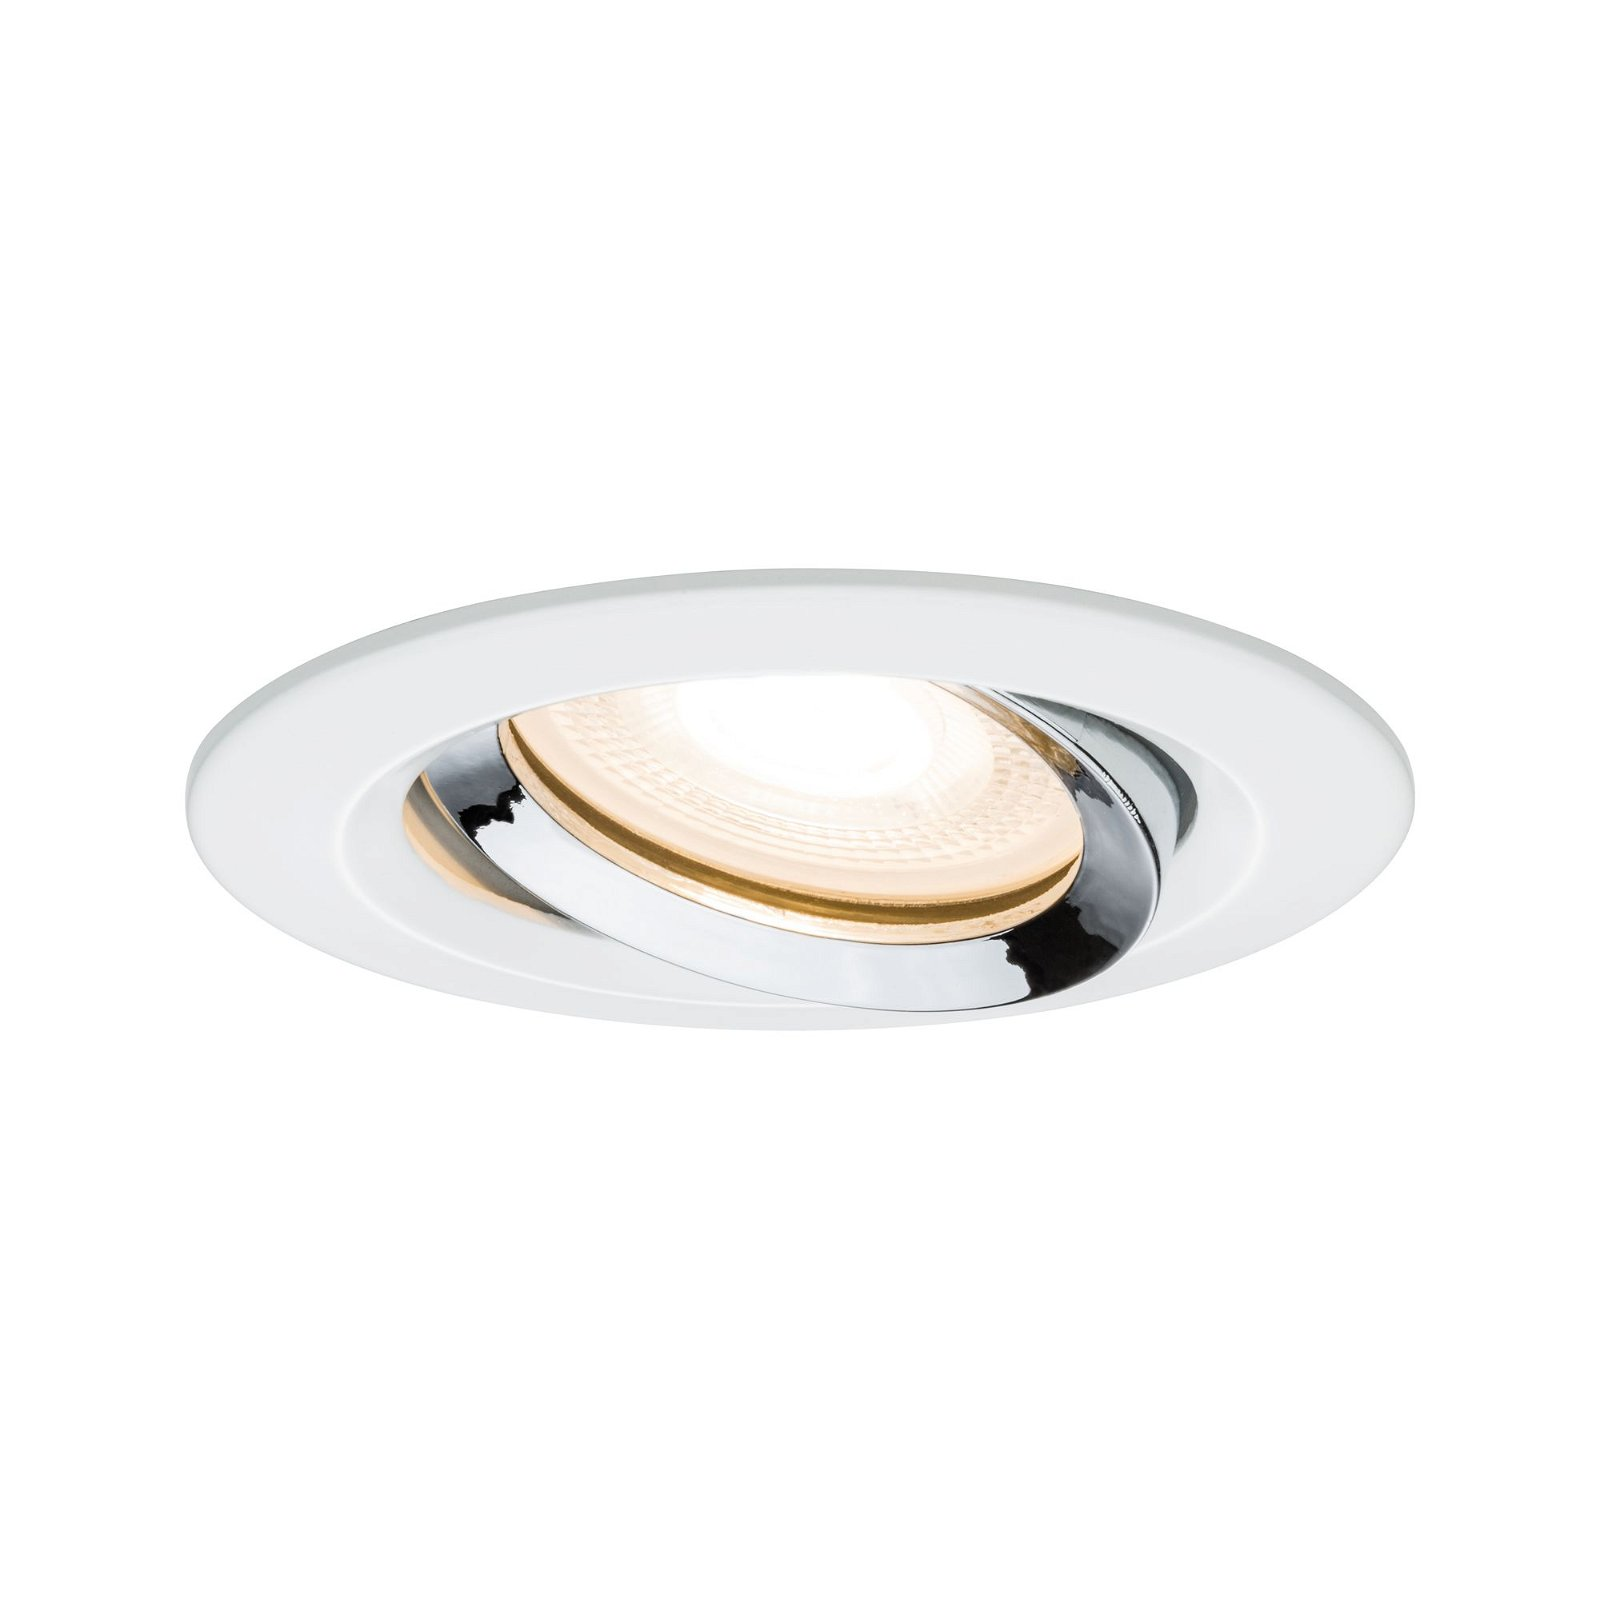 LED-inbouwlamp Nova Plus zwenkbaar IP65 rond 93mm 30° GU5,3 / GU10 max. 35W Wit mat/Chroom